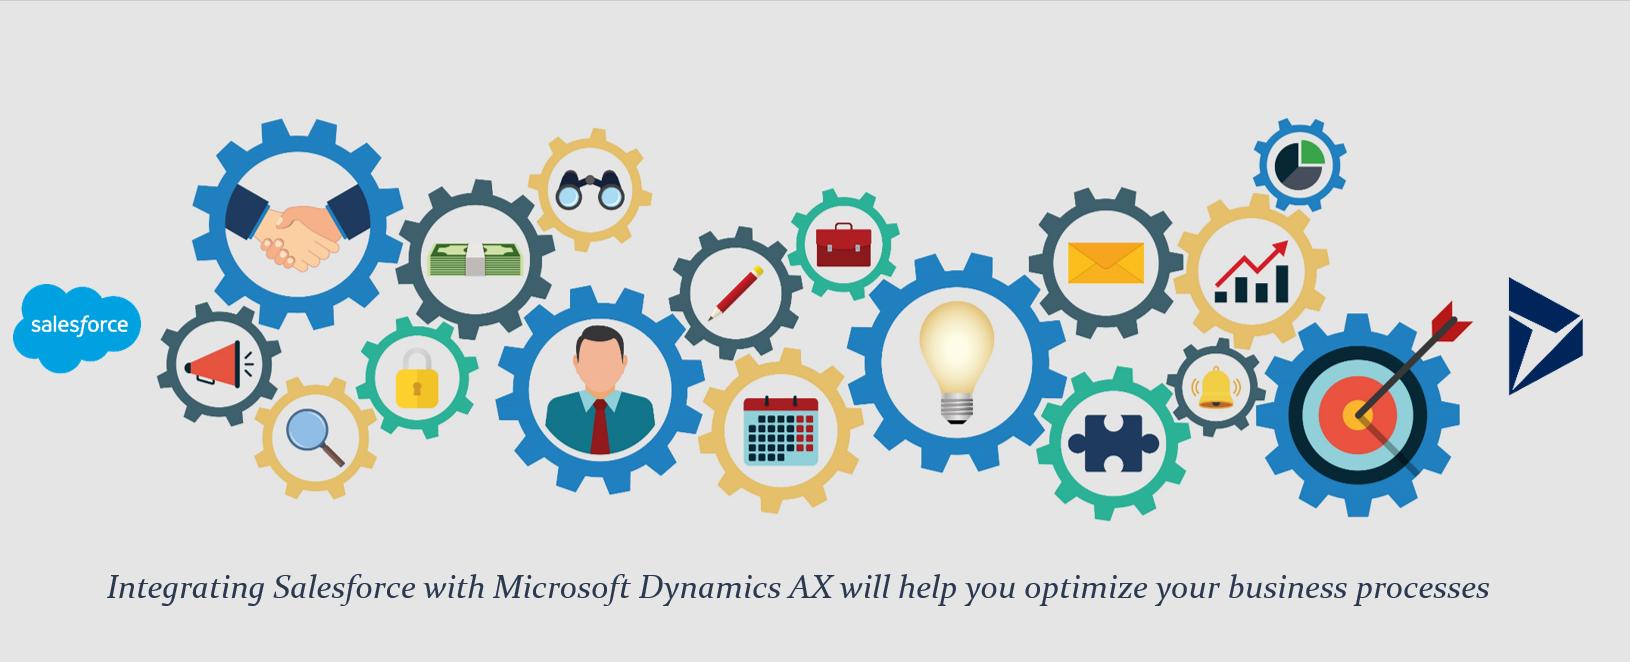 Best Salesforce Microsoft Dynamics AX integration to optimize business processes